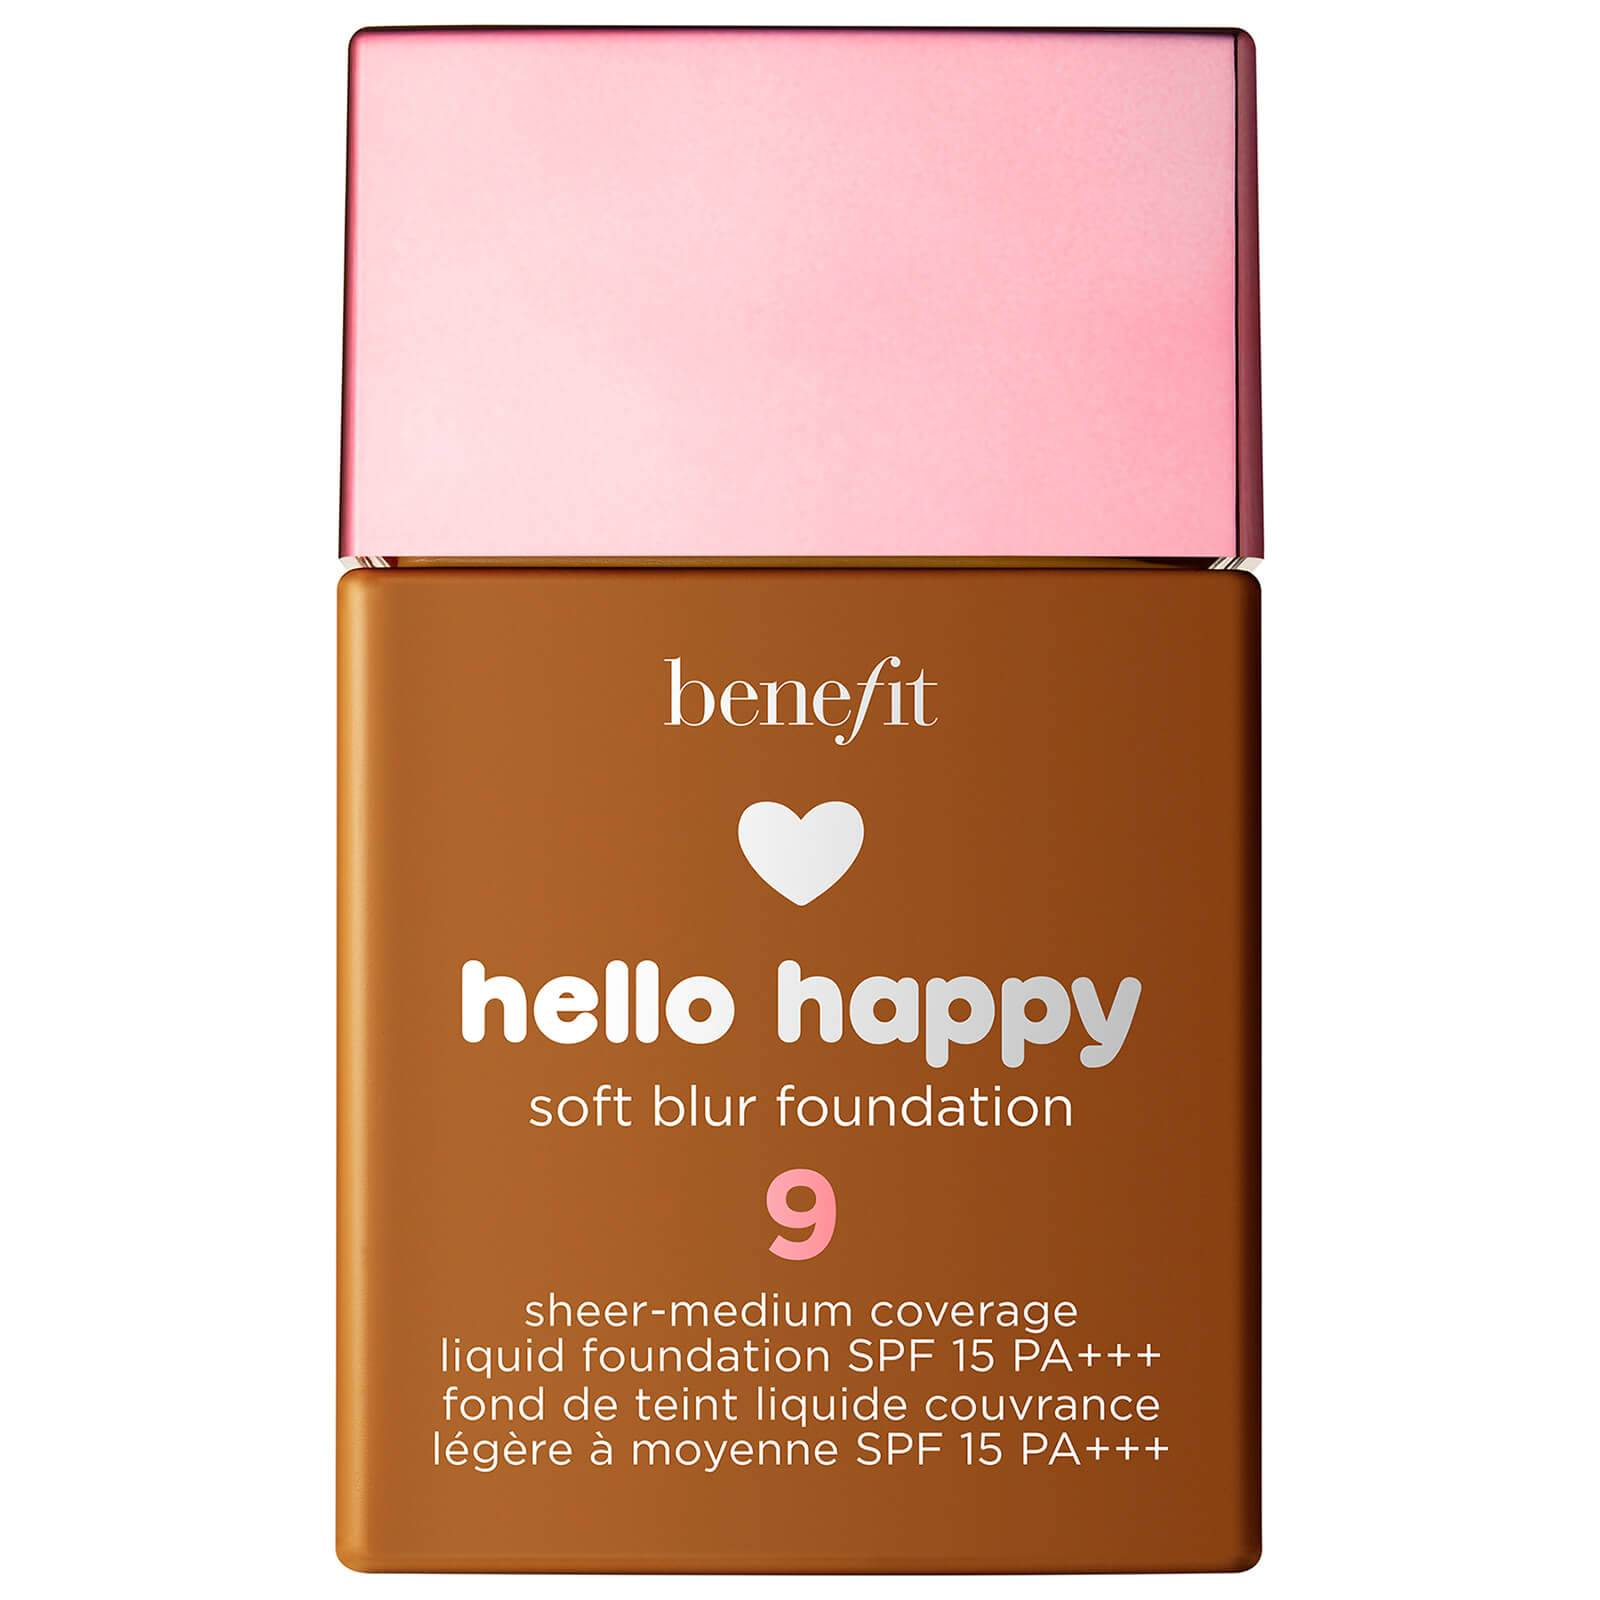 Benefit Hello Happy Soft Blur Foundation (Various Shades) - 9